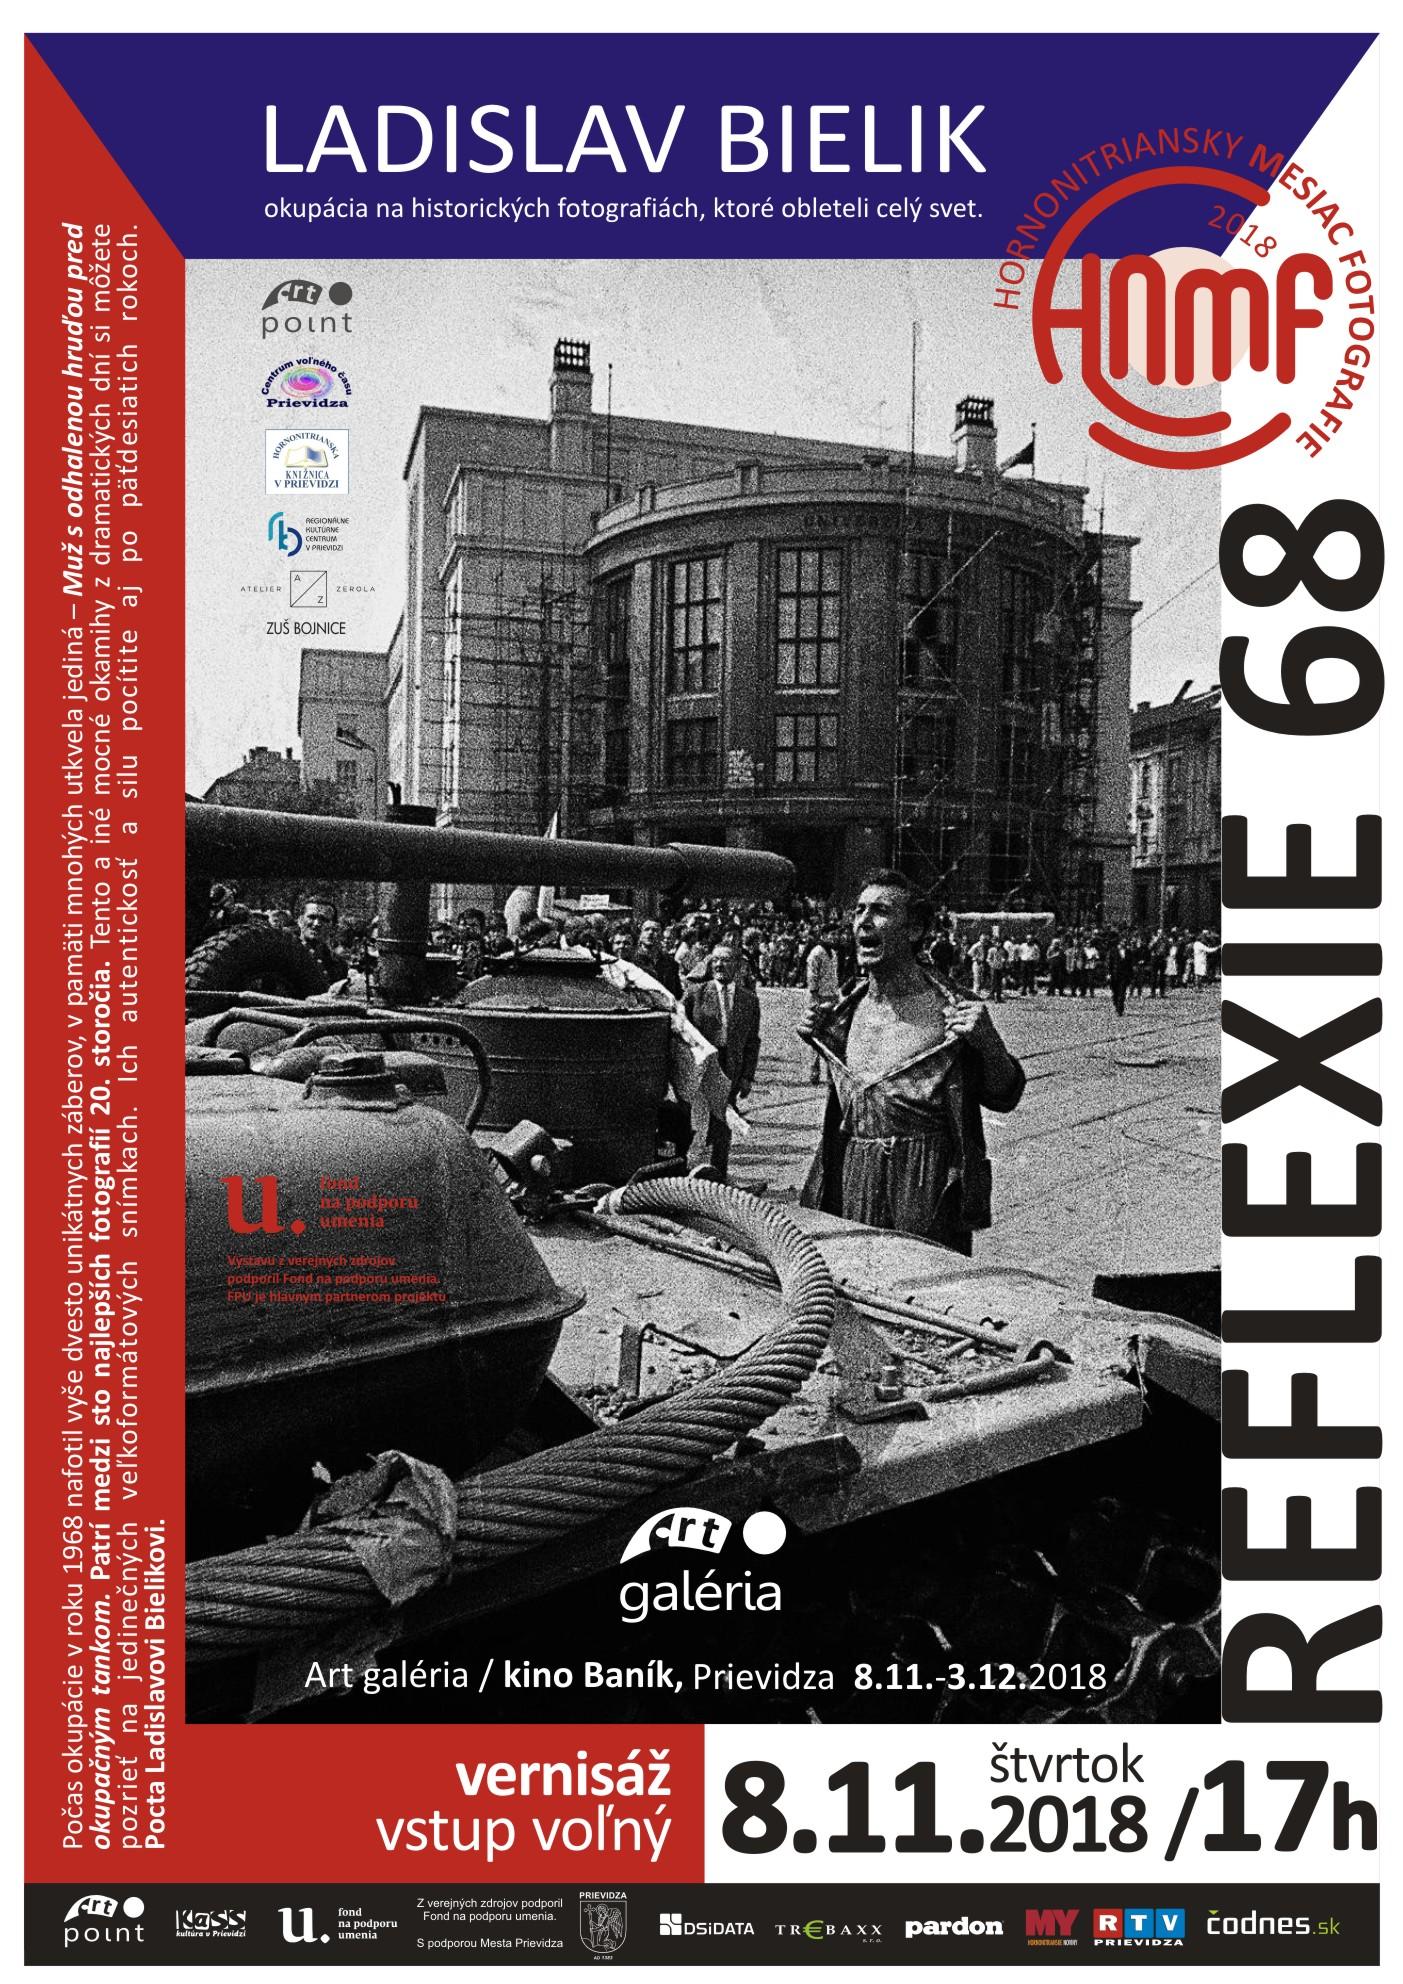 Reflexie 68 - Ladislav Bielik /Hornonitriansky mesiac fotografie